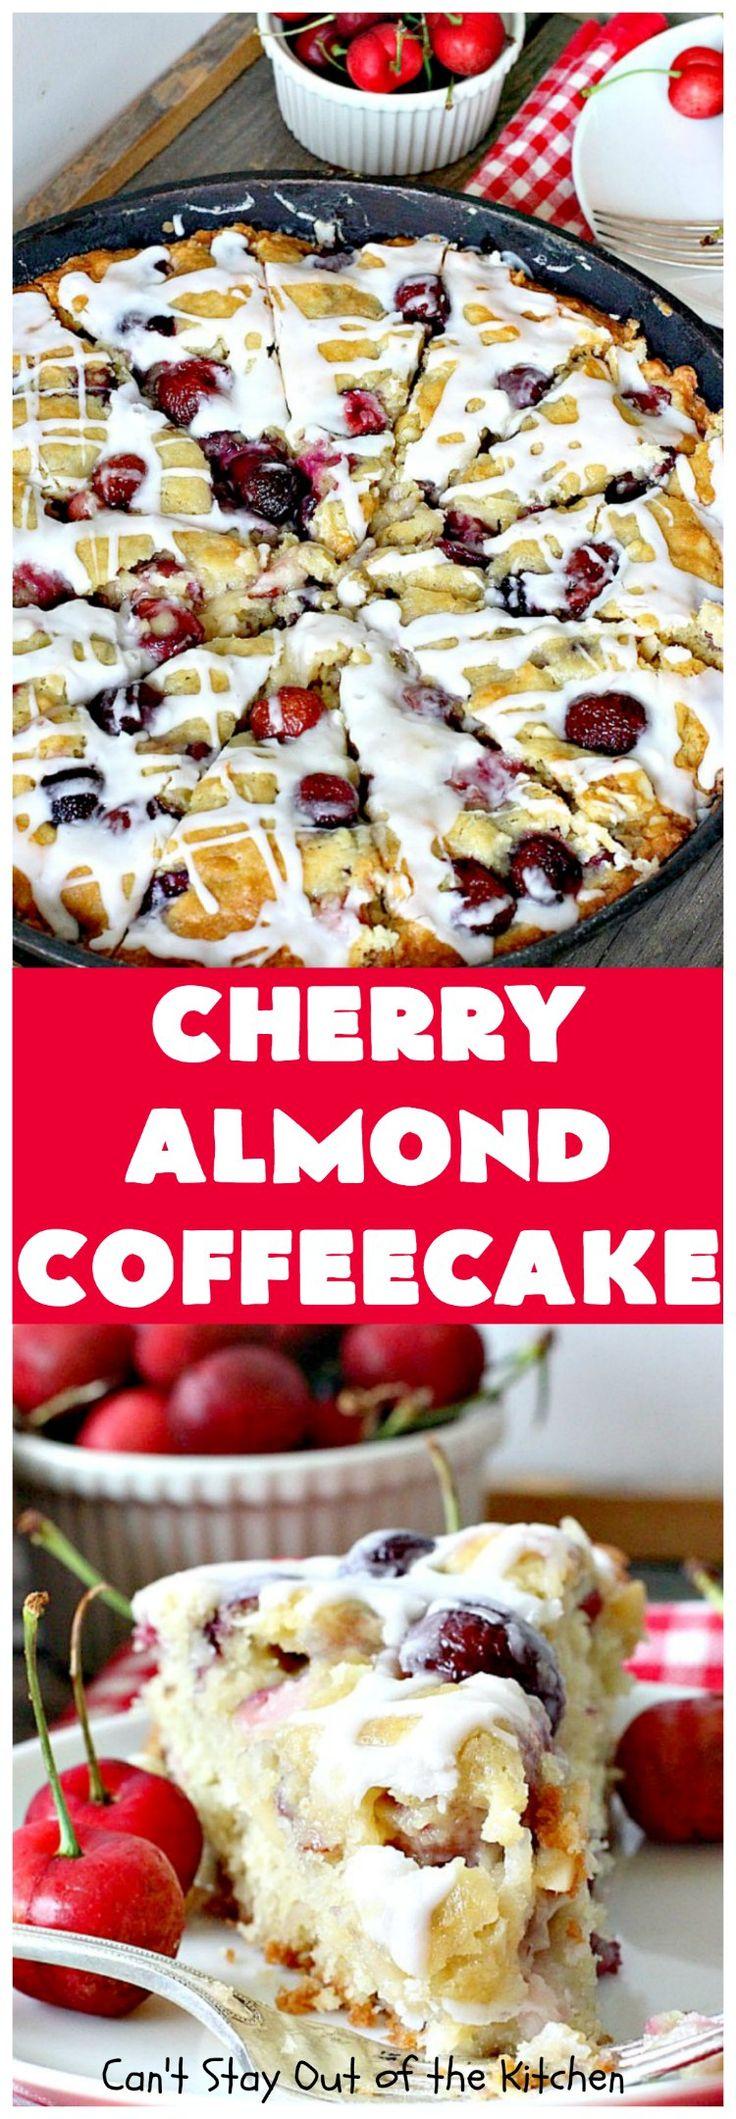 Cherry Almond Coffeecake | DebbieNet.com |